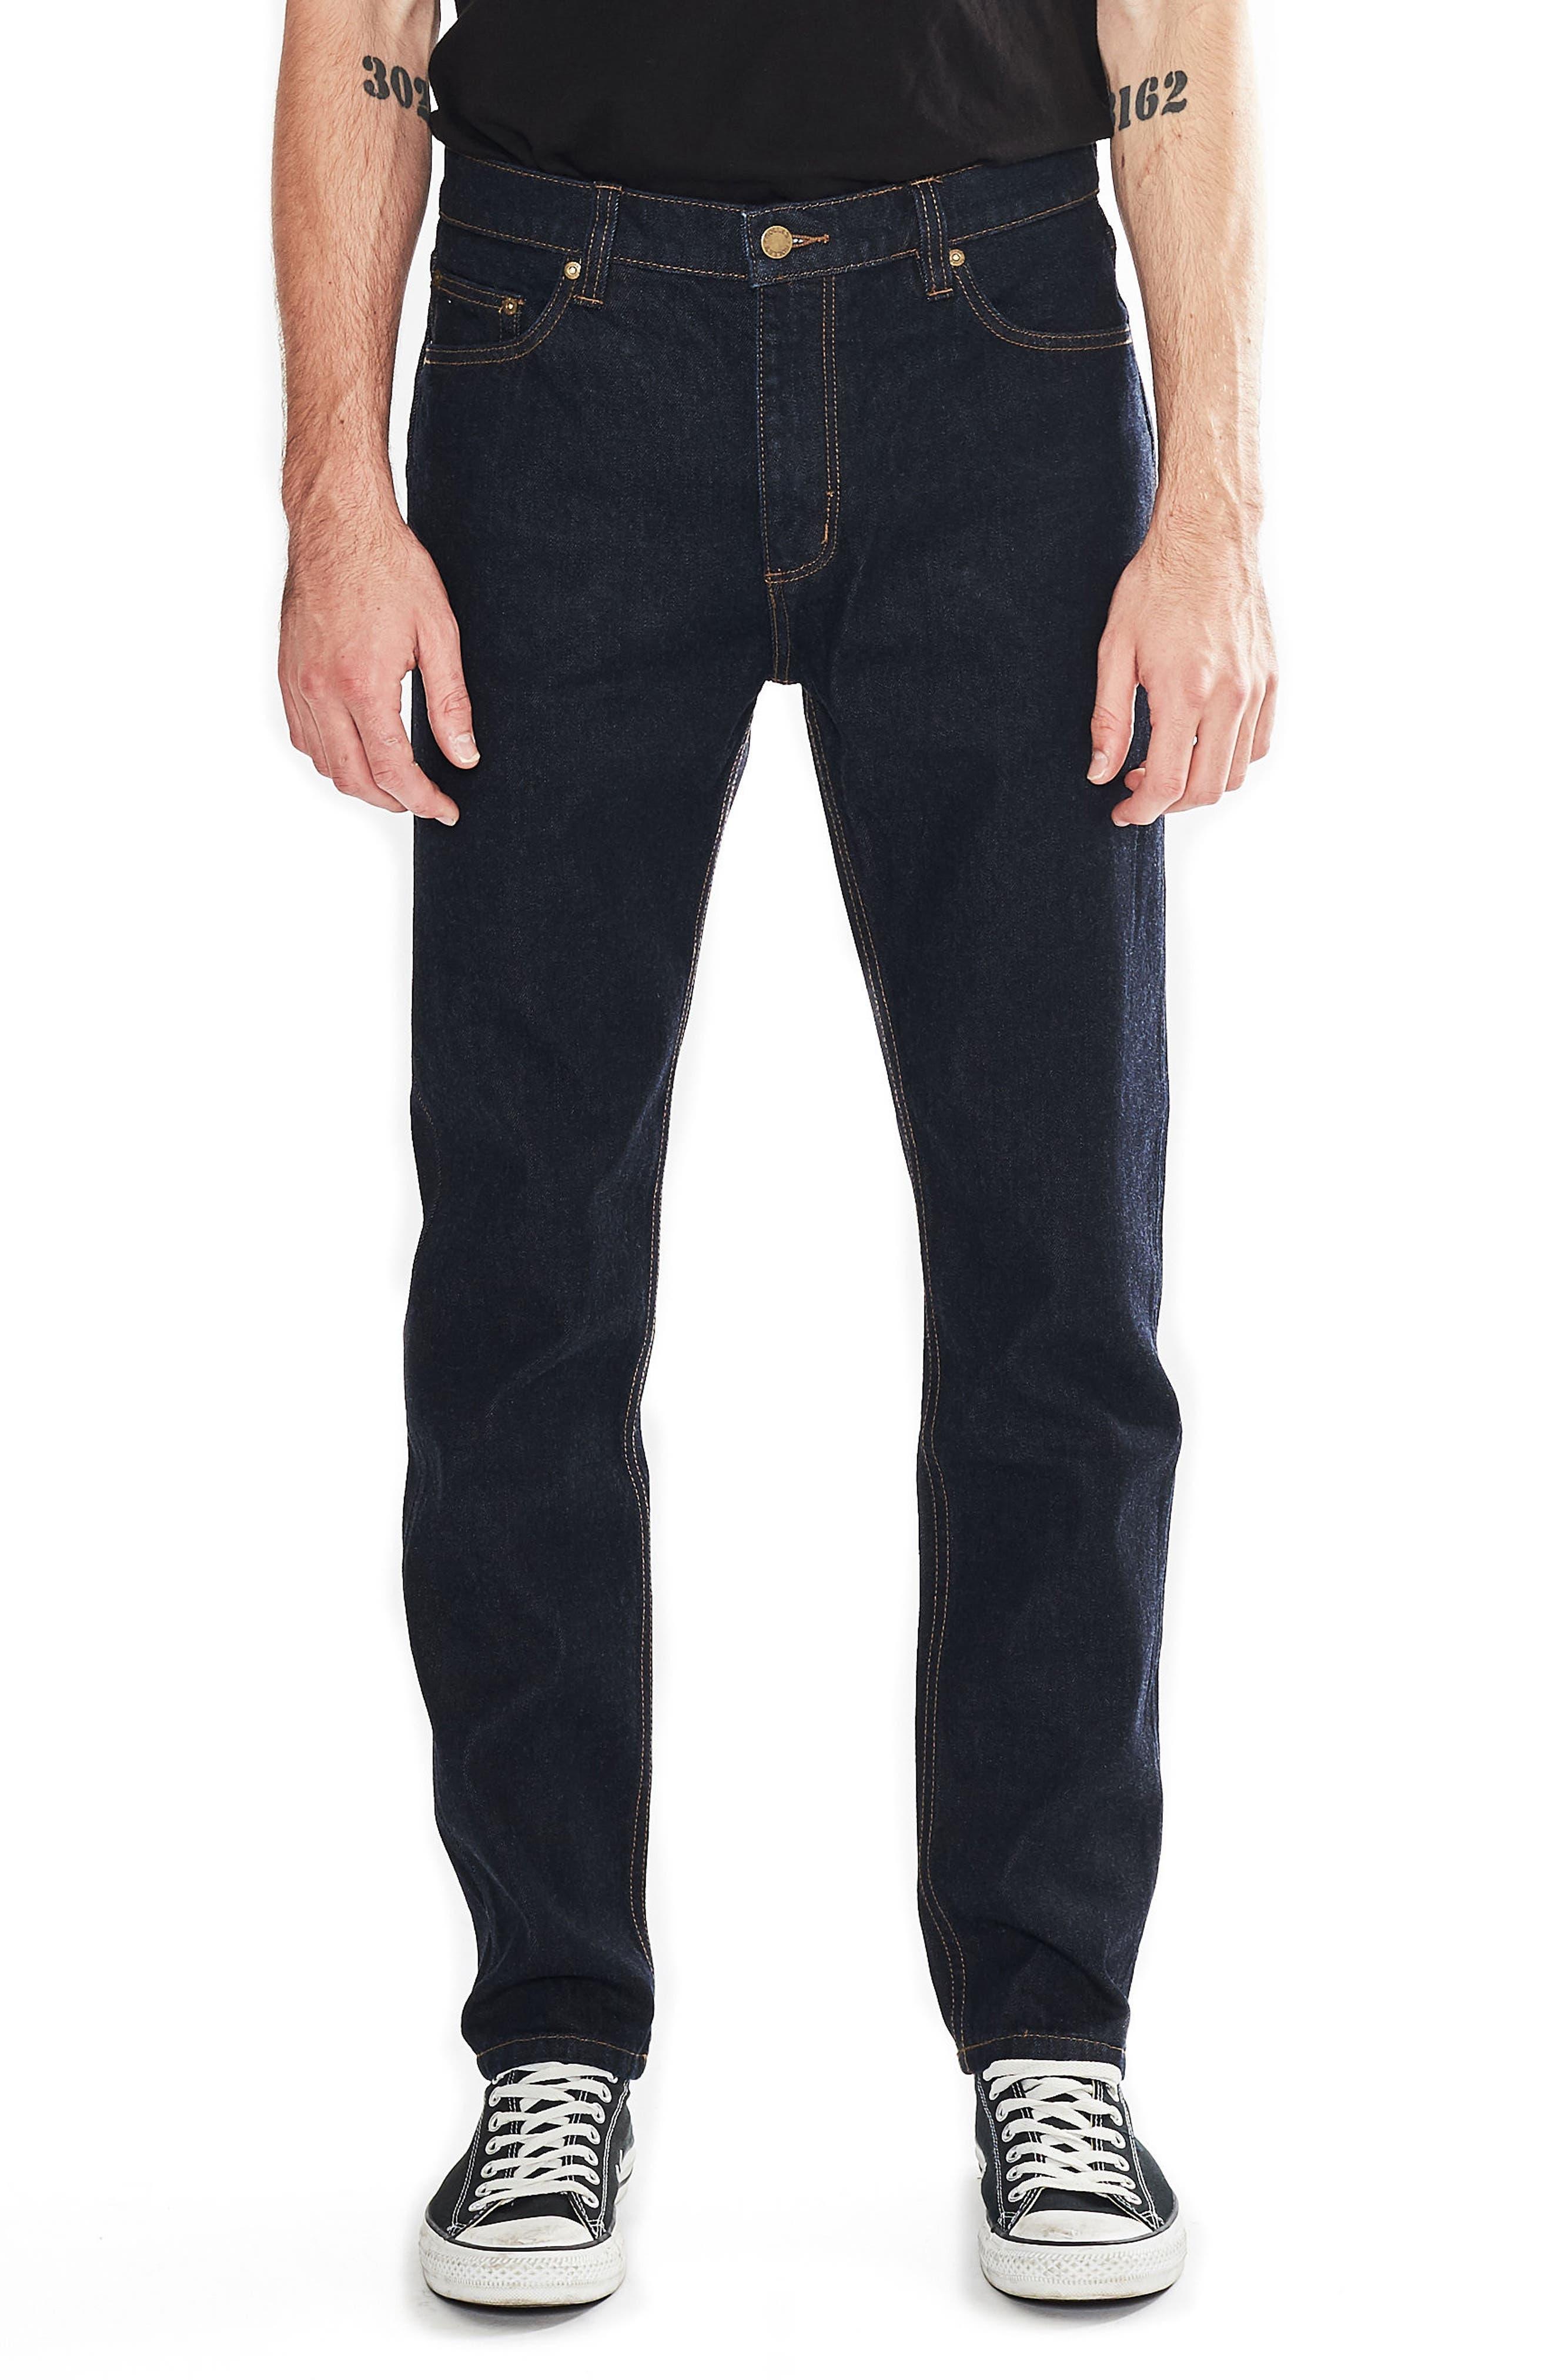 Tim Slims Slim Fit Jeans,                         Main,                         color, Indigo Raw